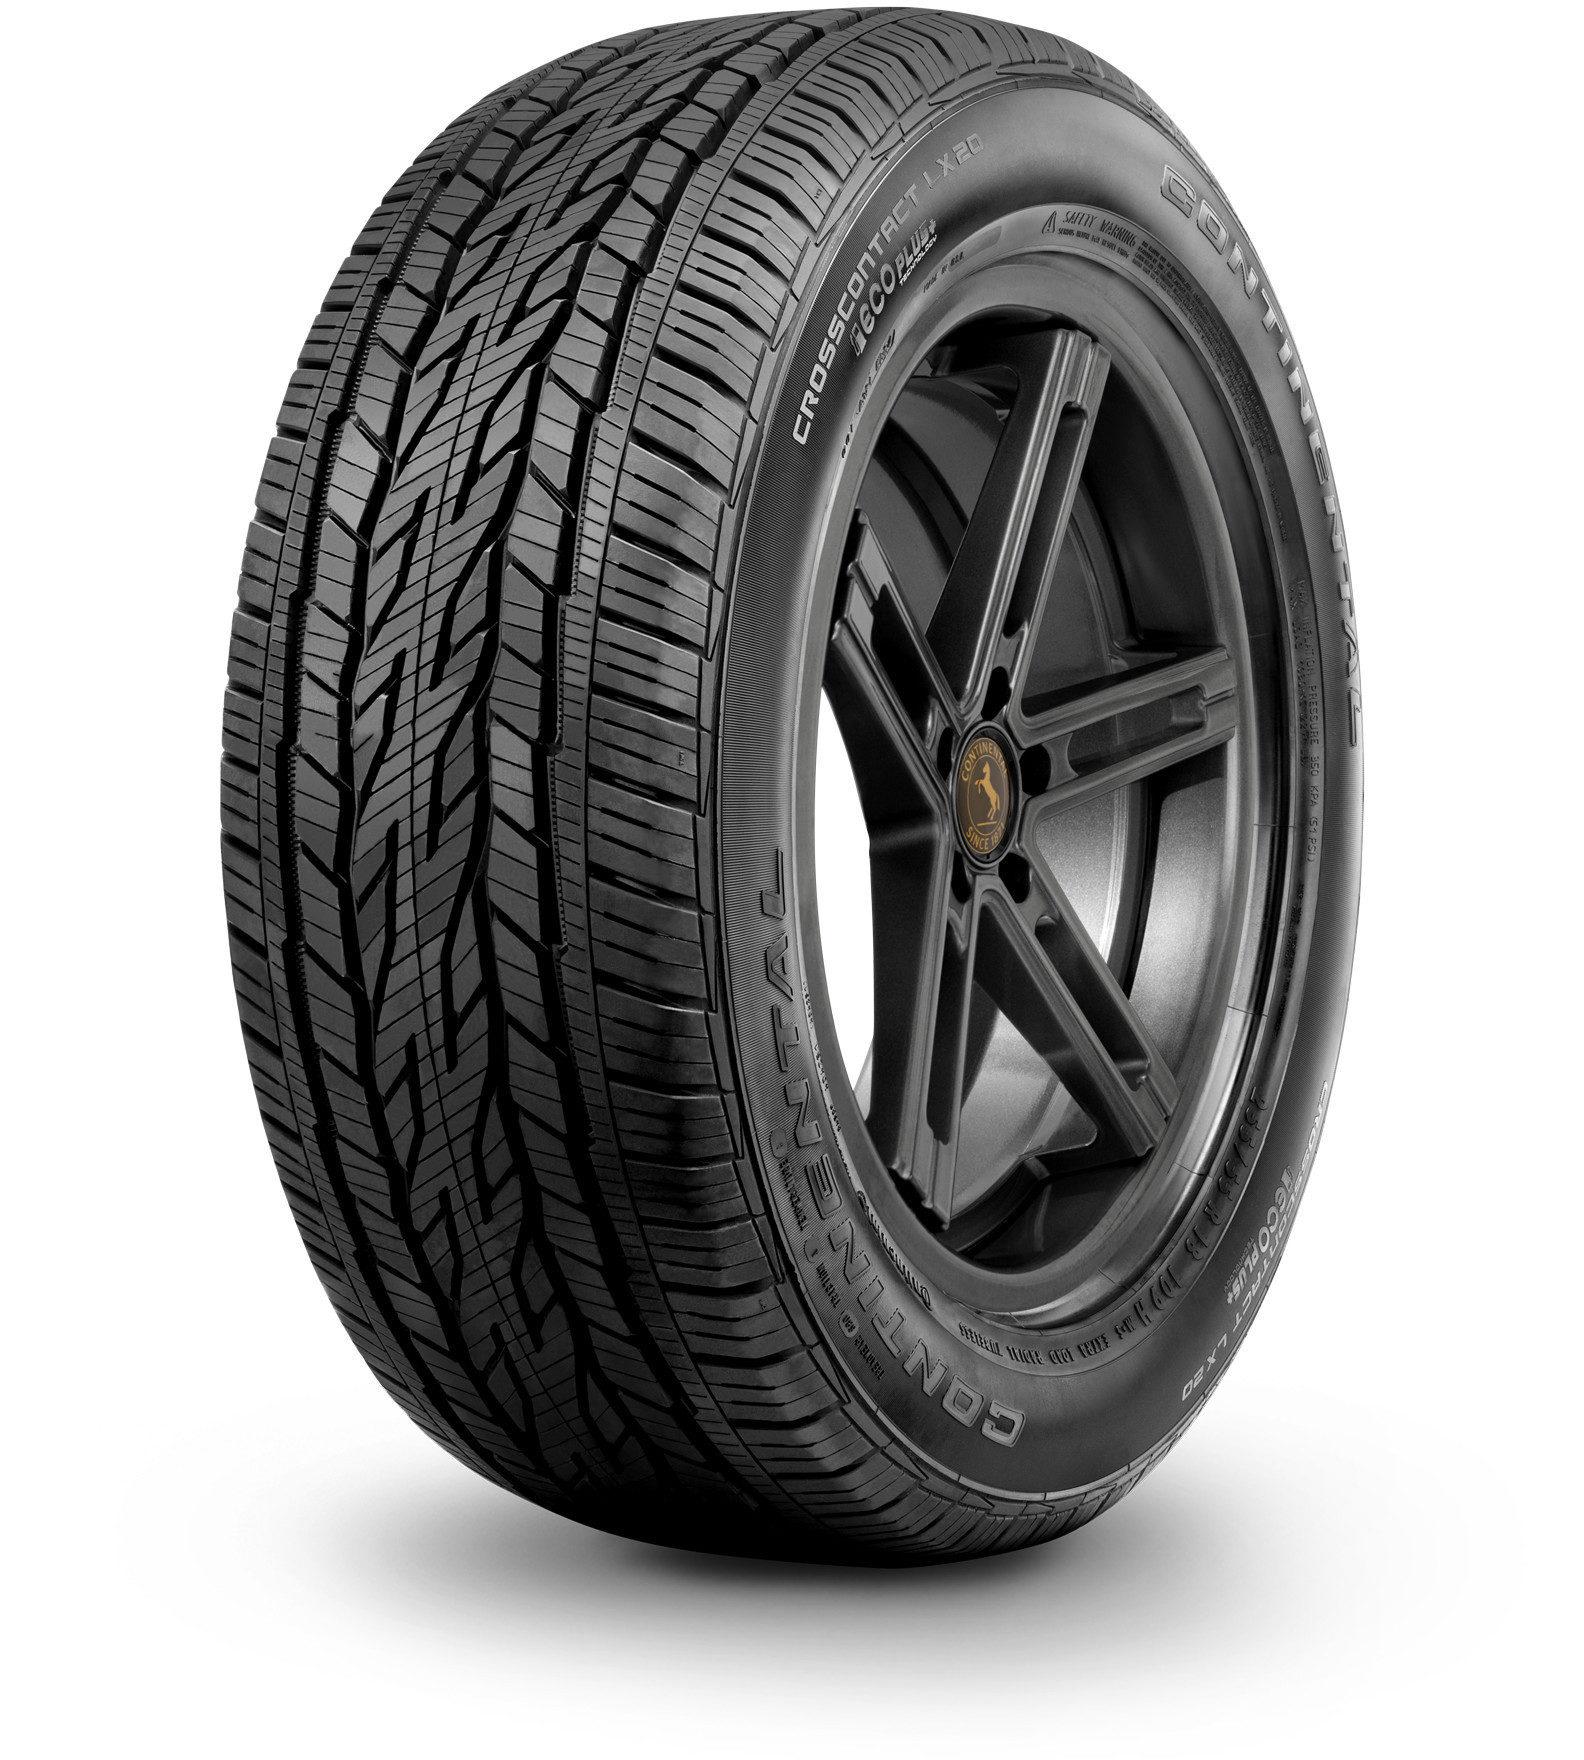 Tire Recalls